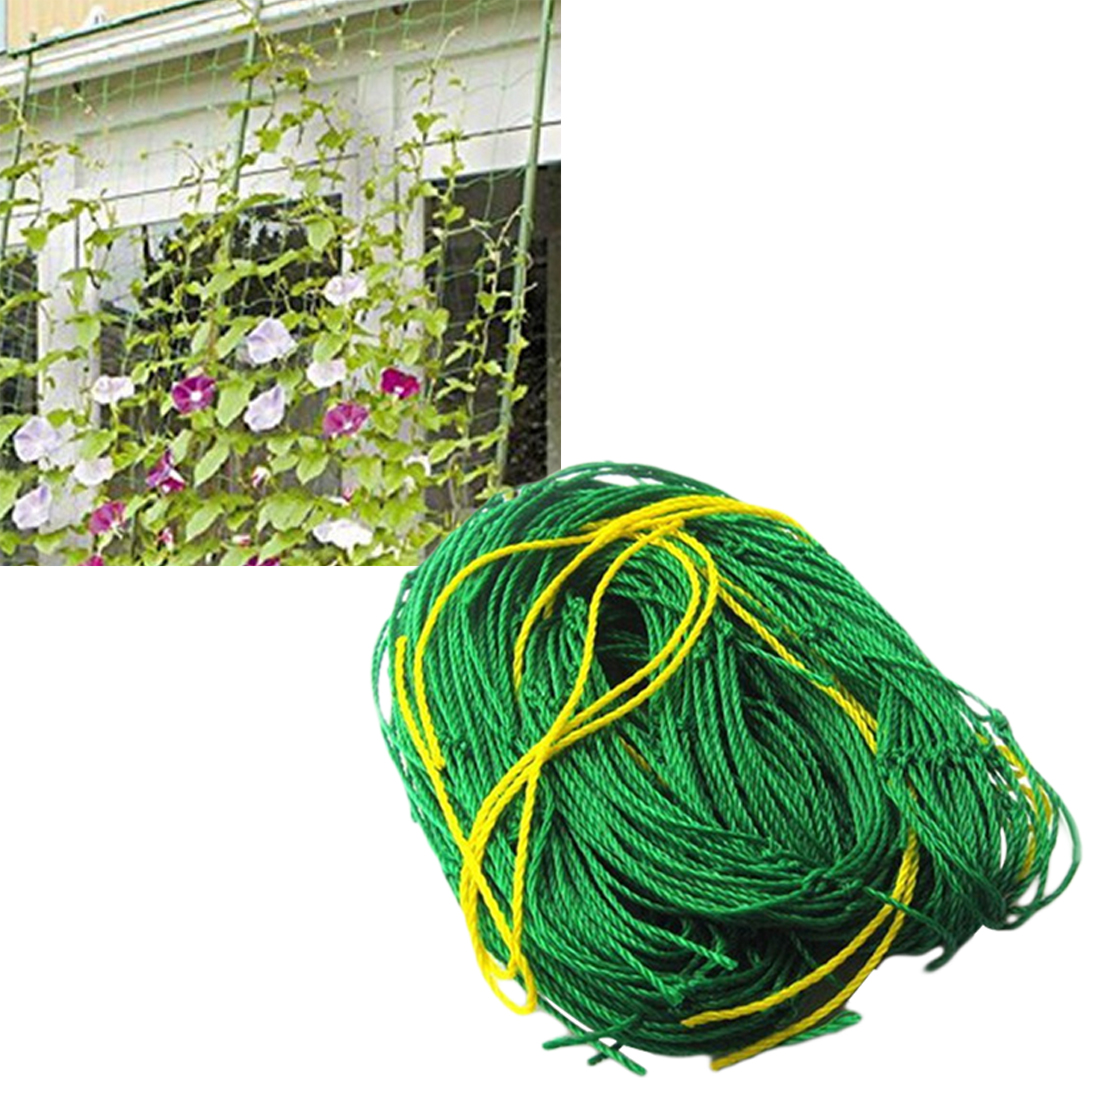 0 9 1 8m Plant Garden Trellis Net Plants Climbing Frame Fruit Tree Protect Anti Pest Weed Garden Supples